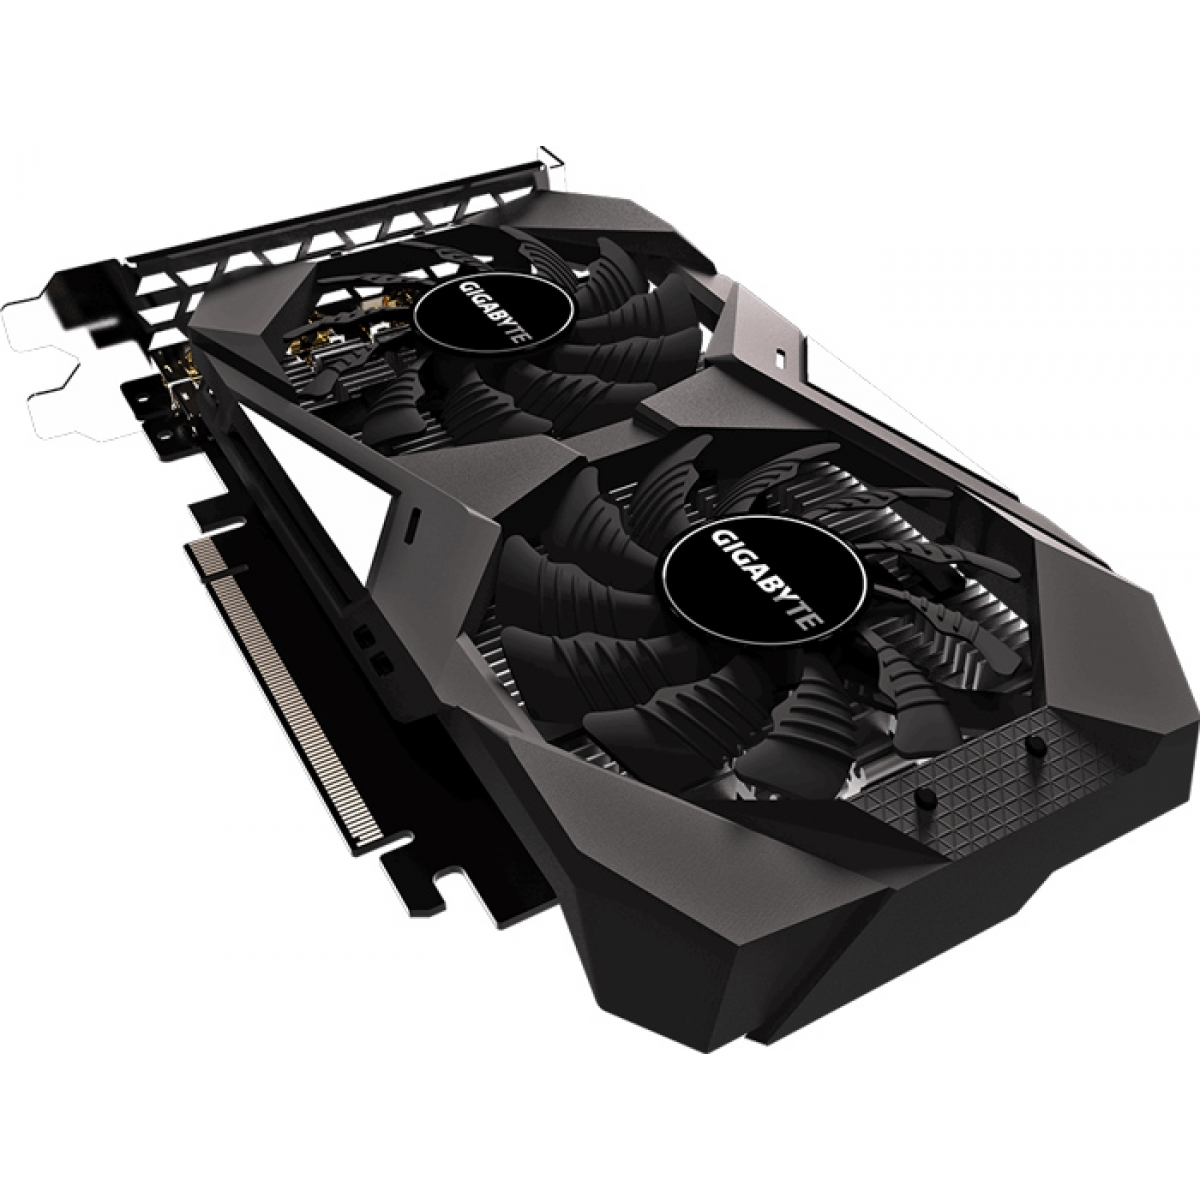 Placa de Video Gigabyte GeForce GTX 1650 Windforce OC Dual, 4GB GDDR5, 128Bit, GV-N1650WF2OC-4GD